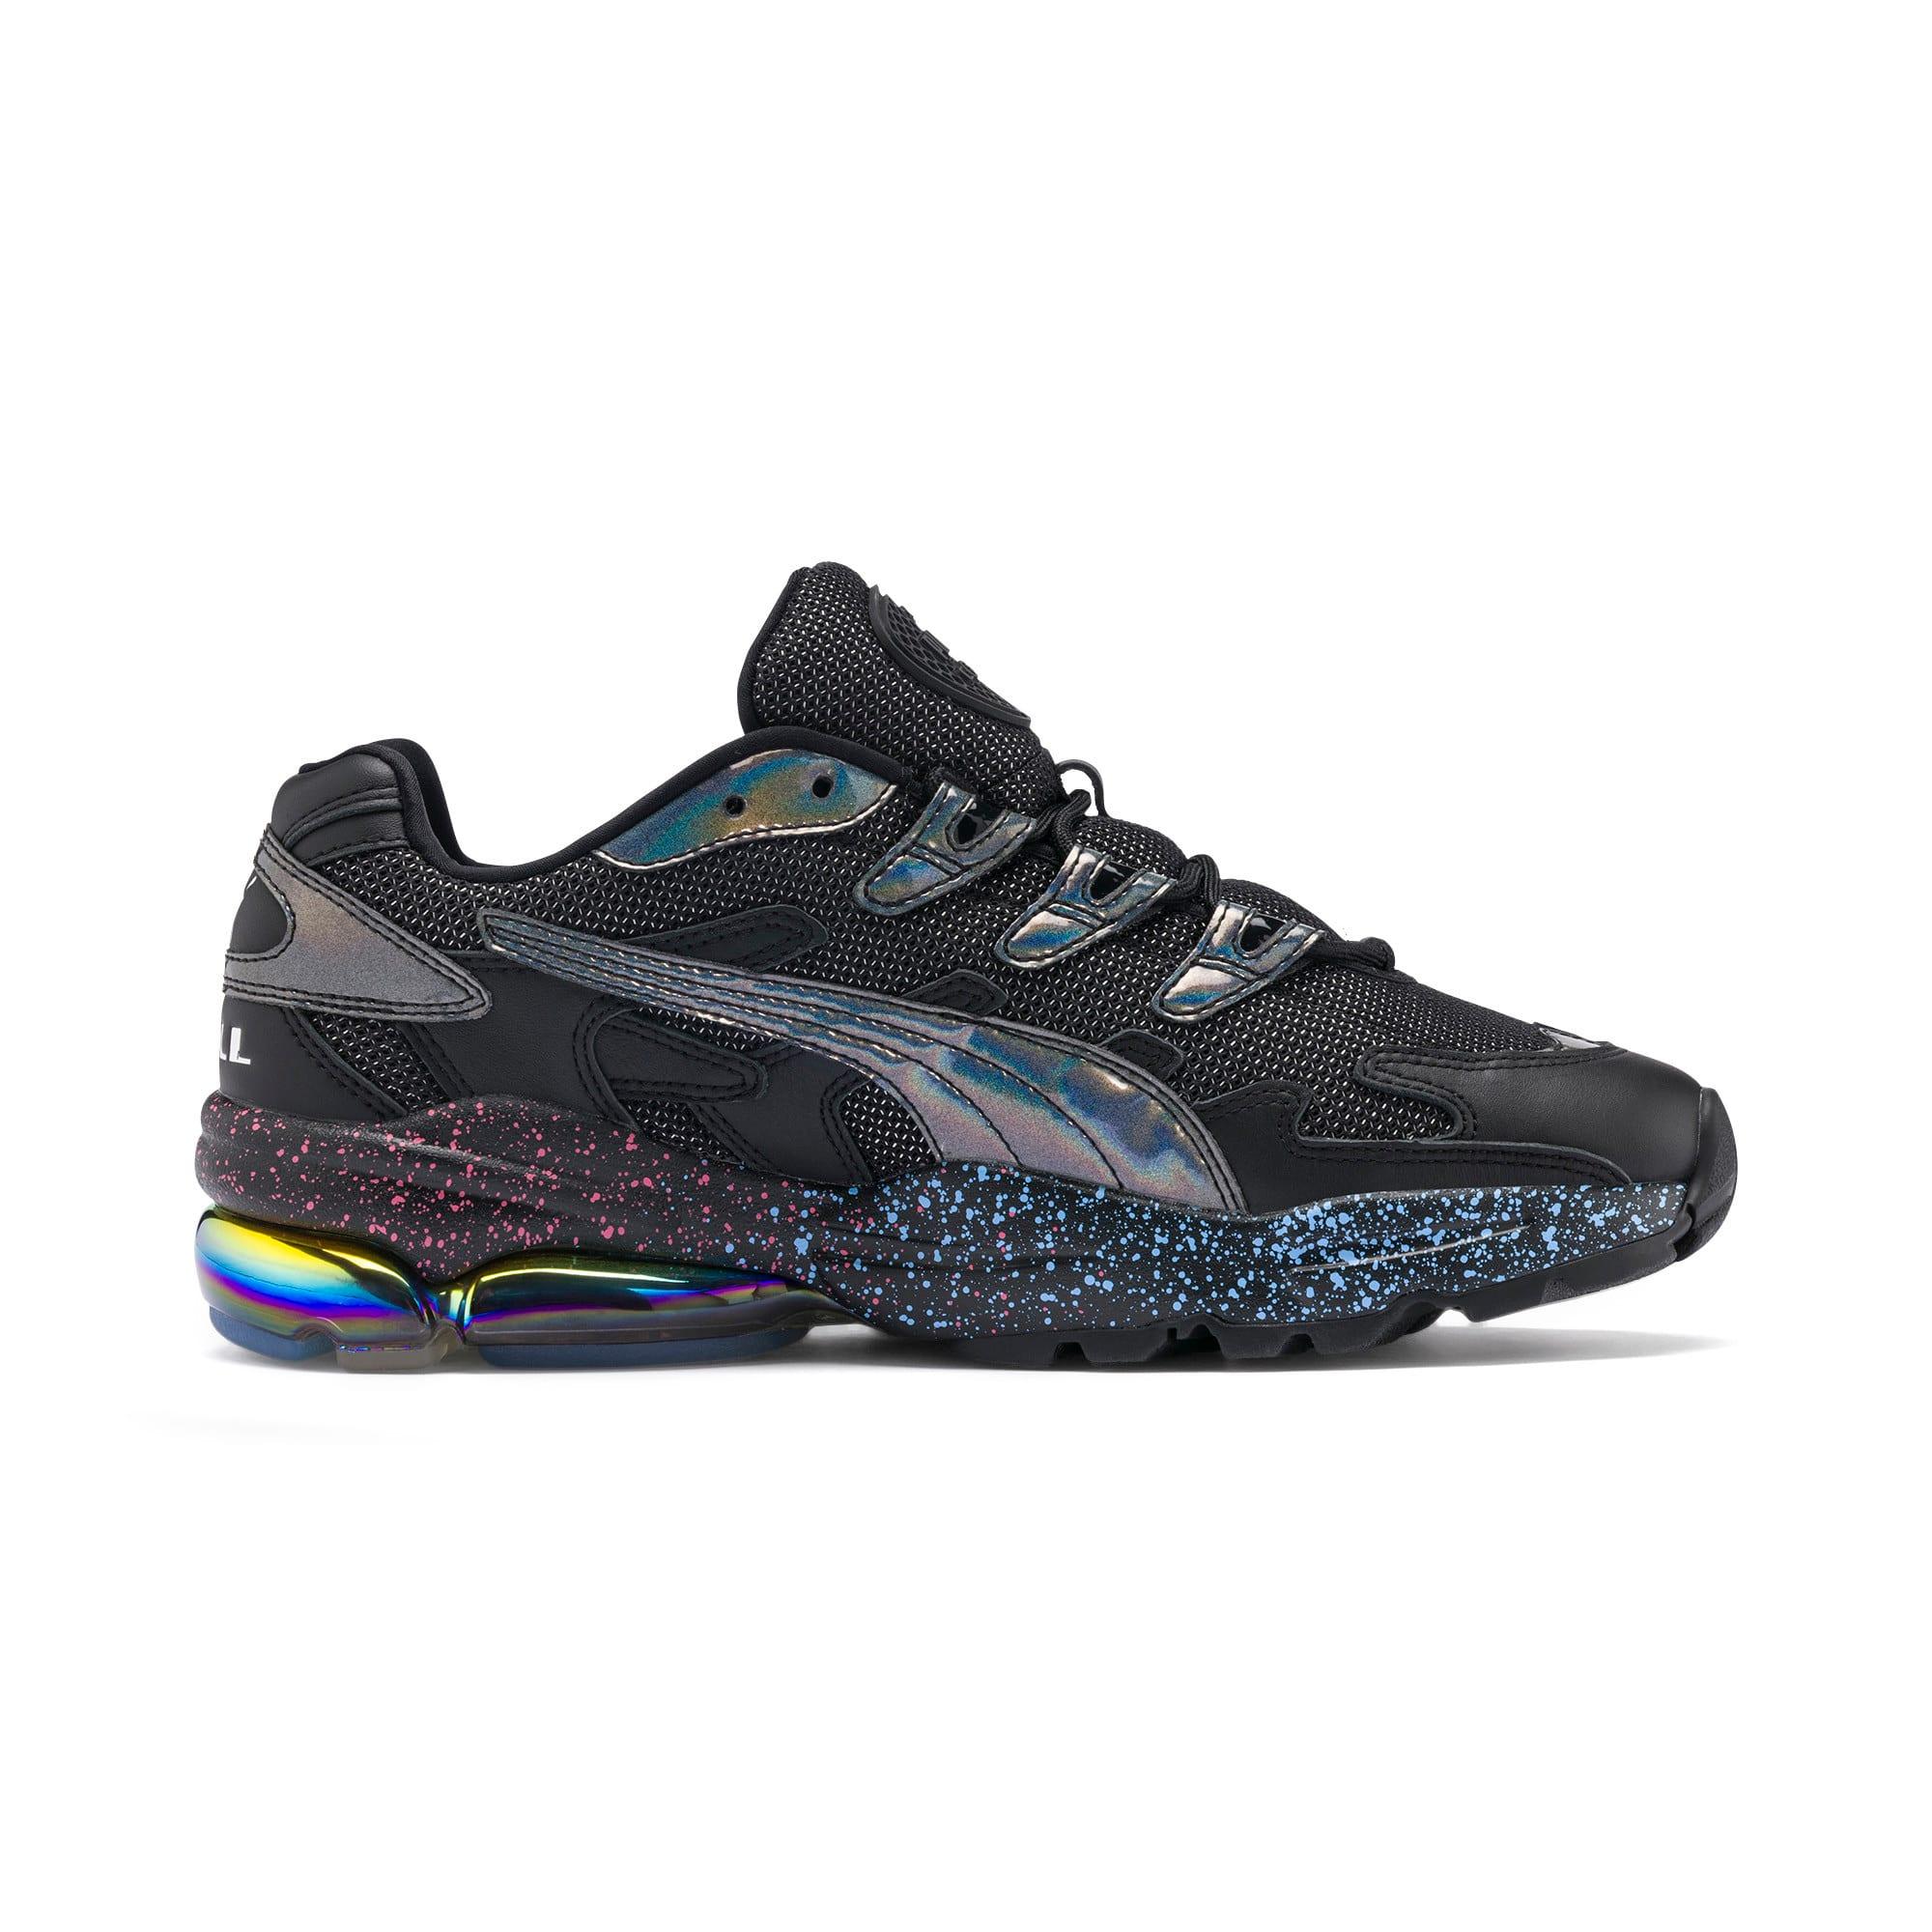 Thumbnail 5 of CELL Alien Space Explorer Sneaker, Puma Black-Puma Black, medium